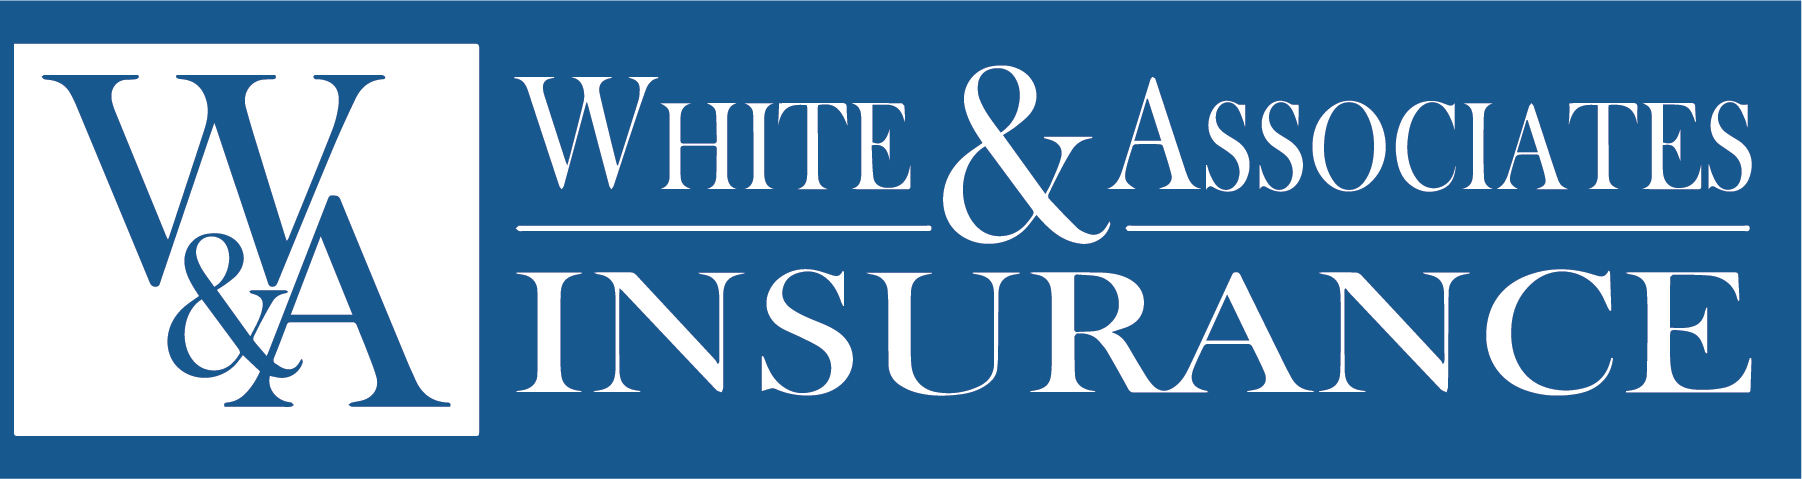 White & Associates Insurance